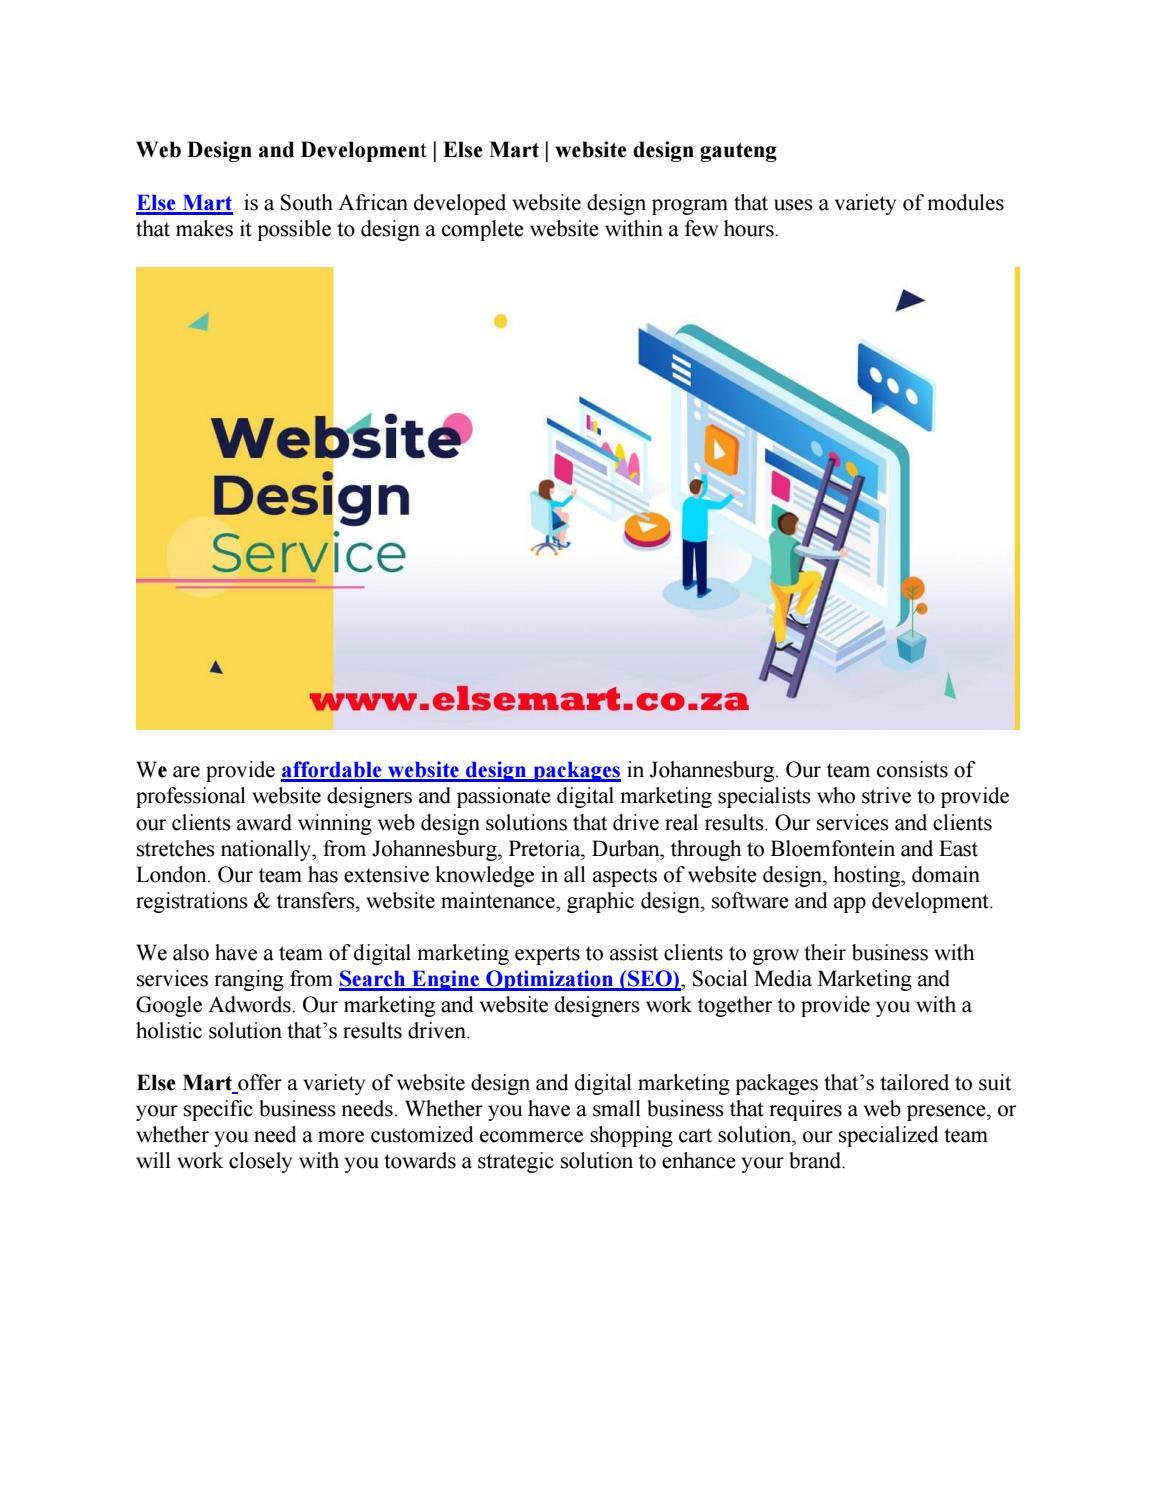 Web Design And Development Else Mart Website Design Gauteng By Arjun Adhikari Issuu